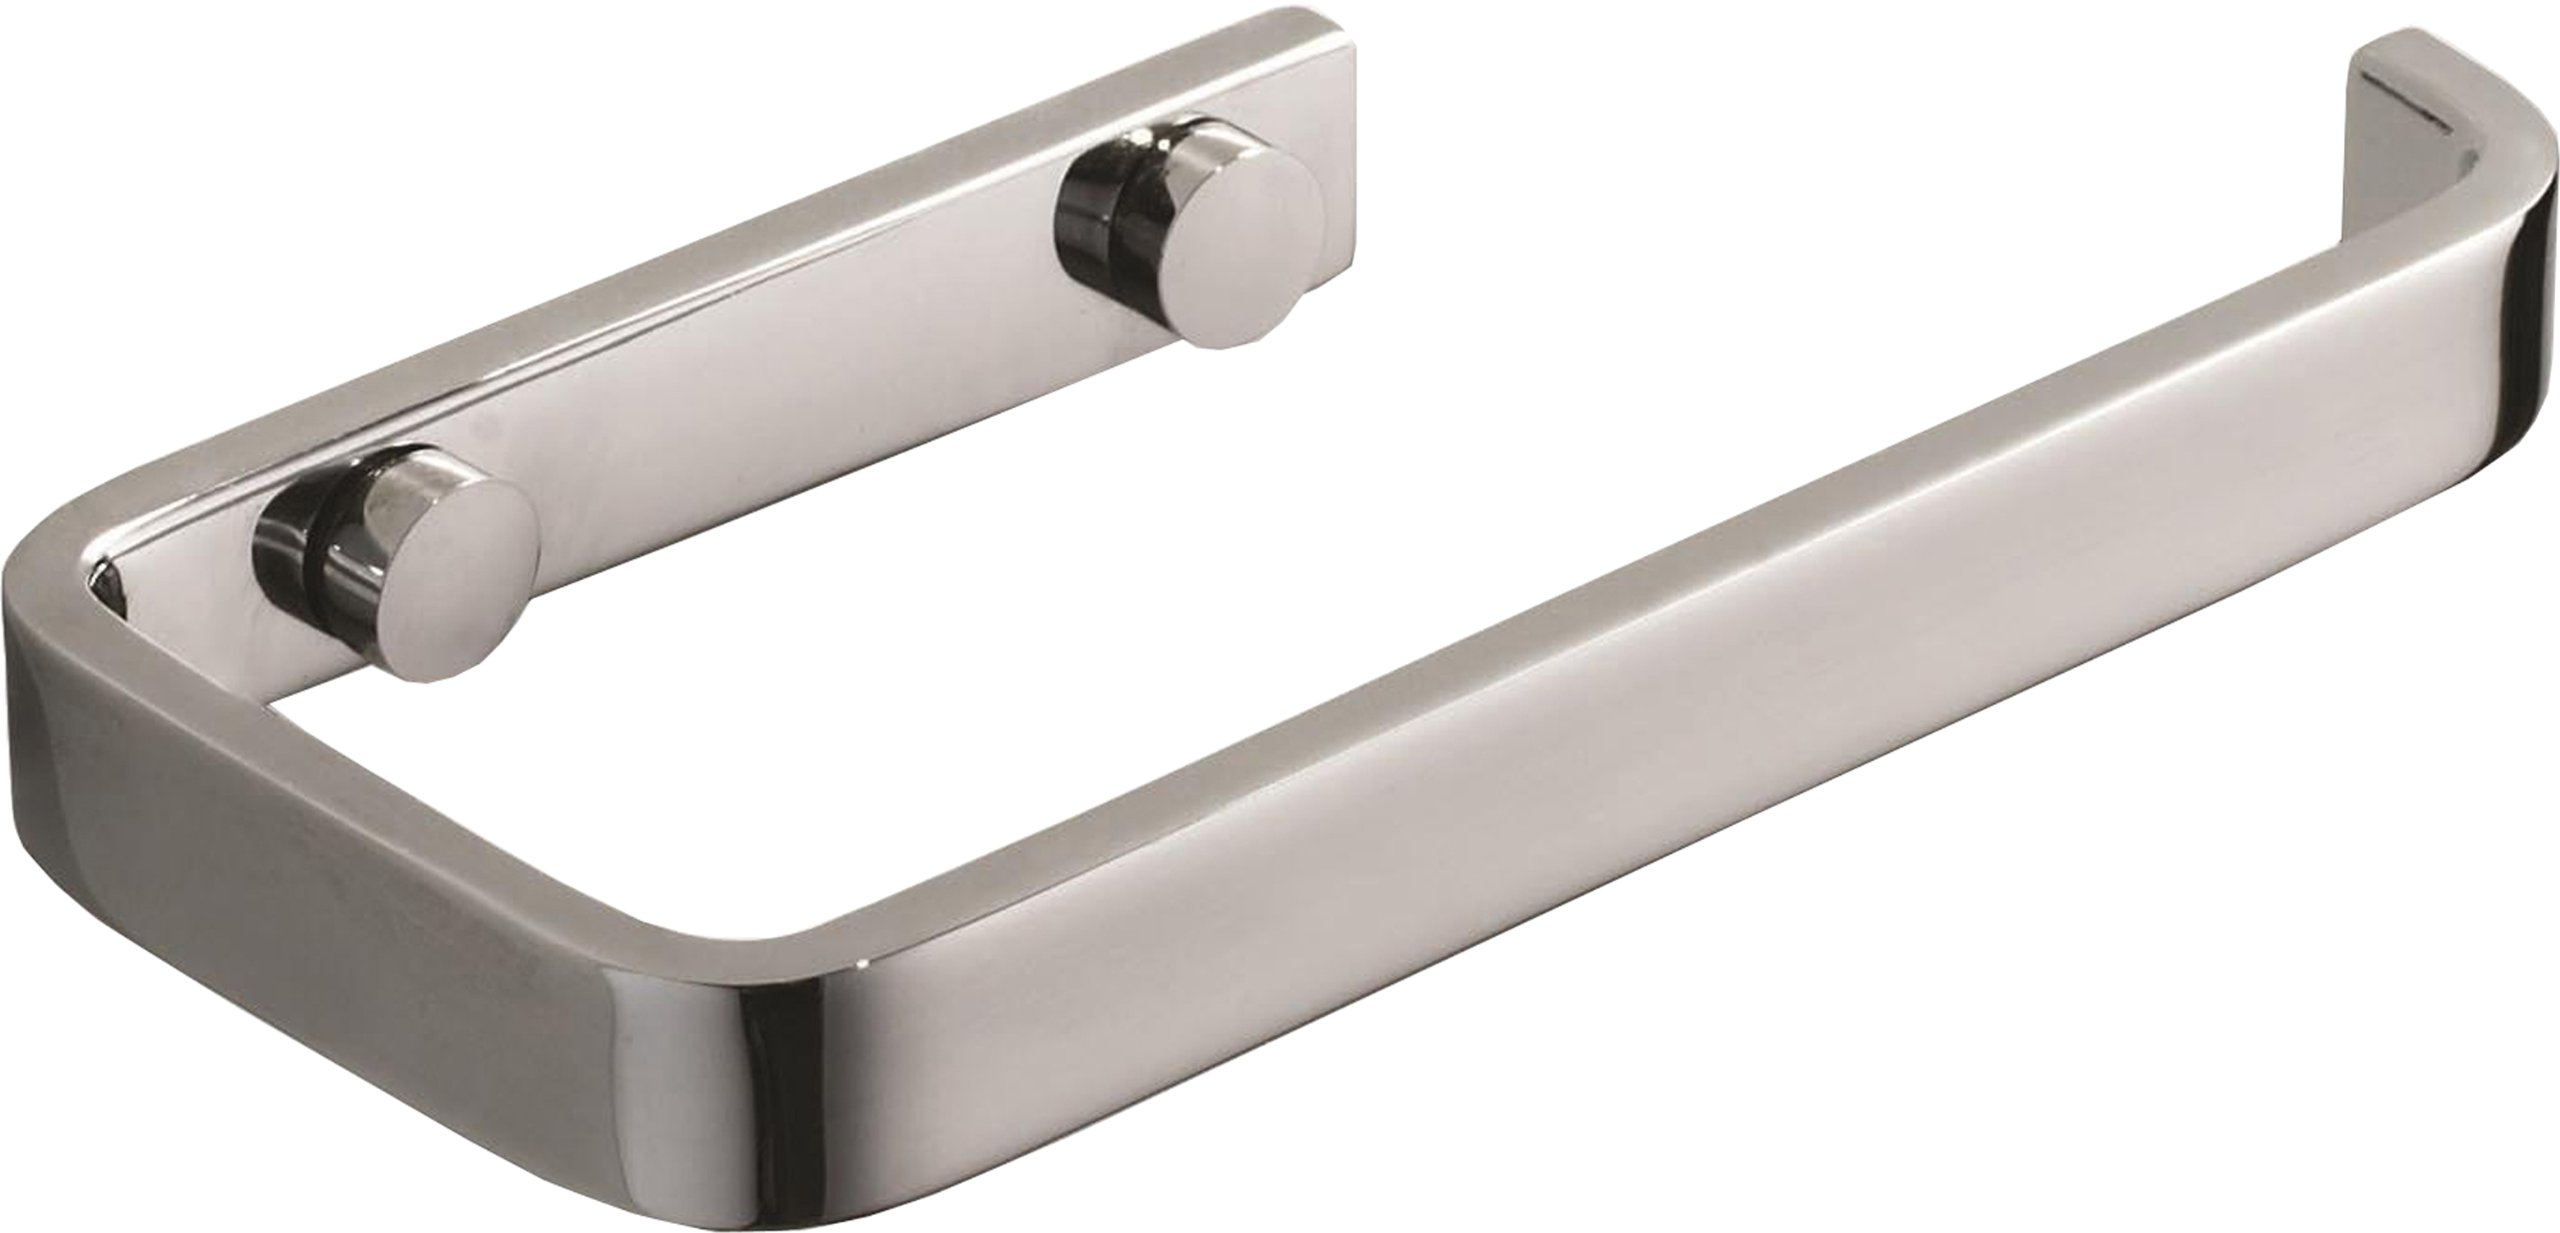 Atlas Homewares SOTP-CH  Solange Toilet Paper Bar, Polished Chrome